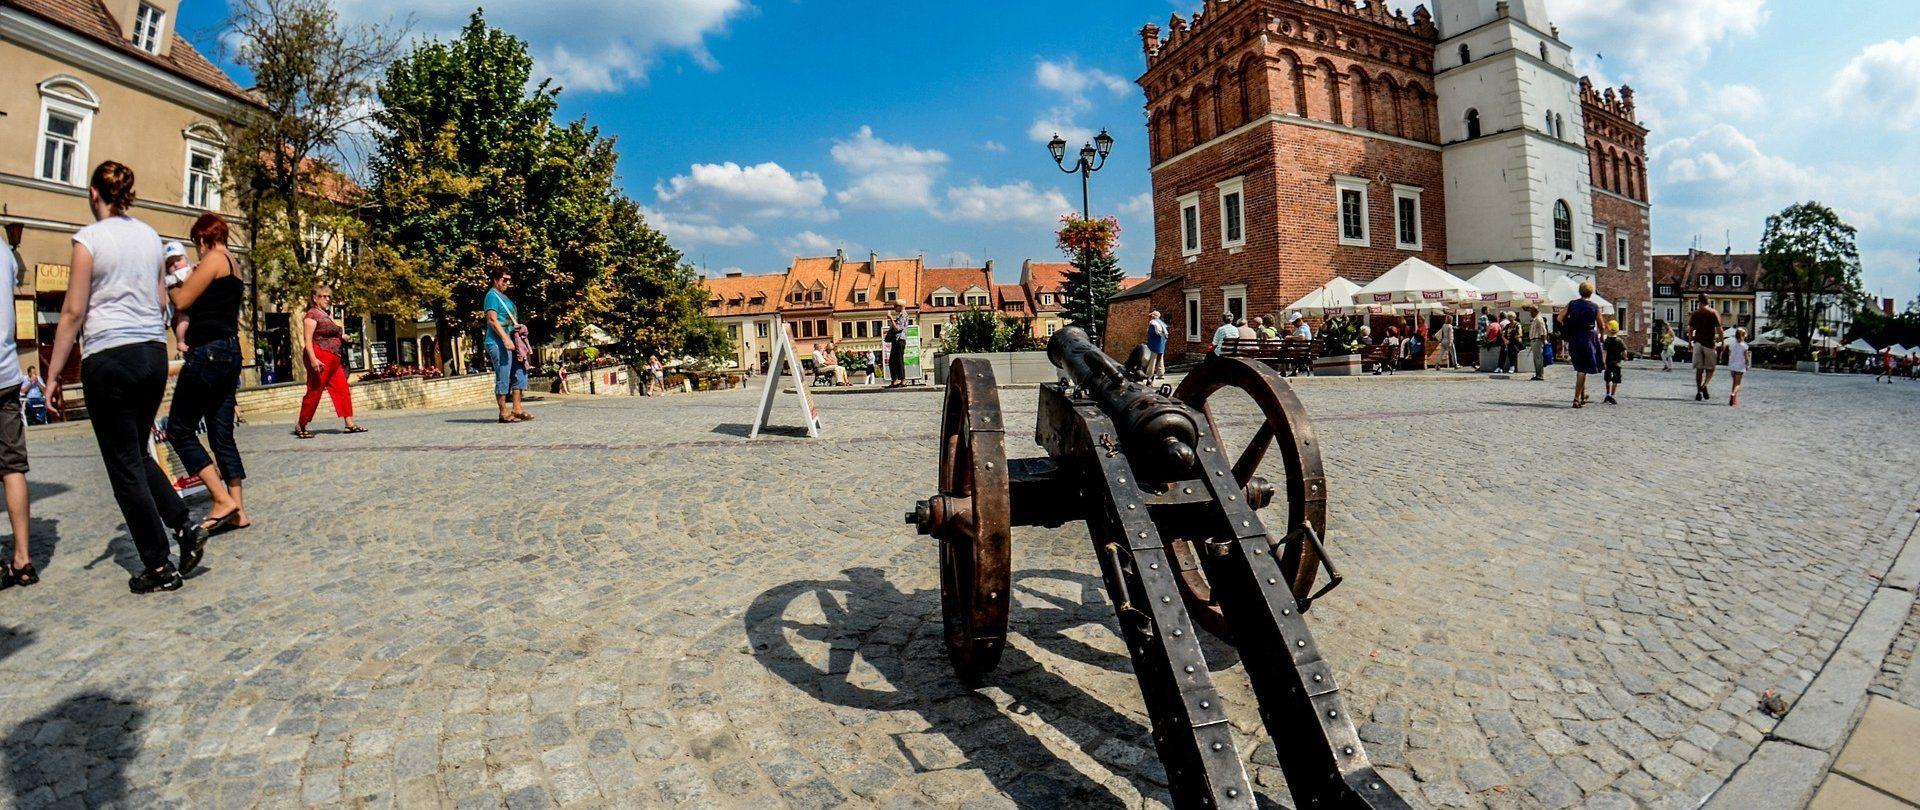 Sandomierz - architektura